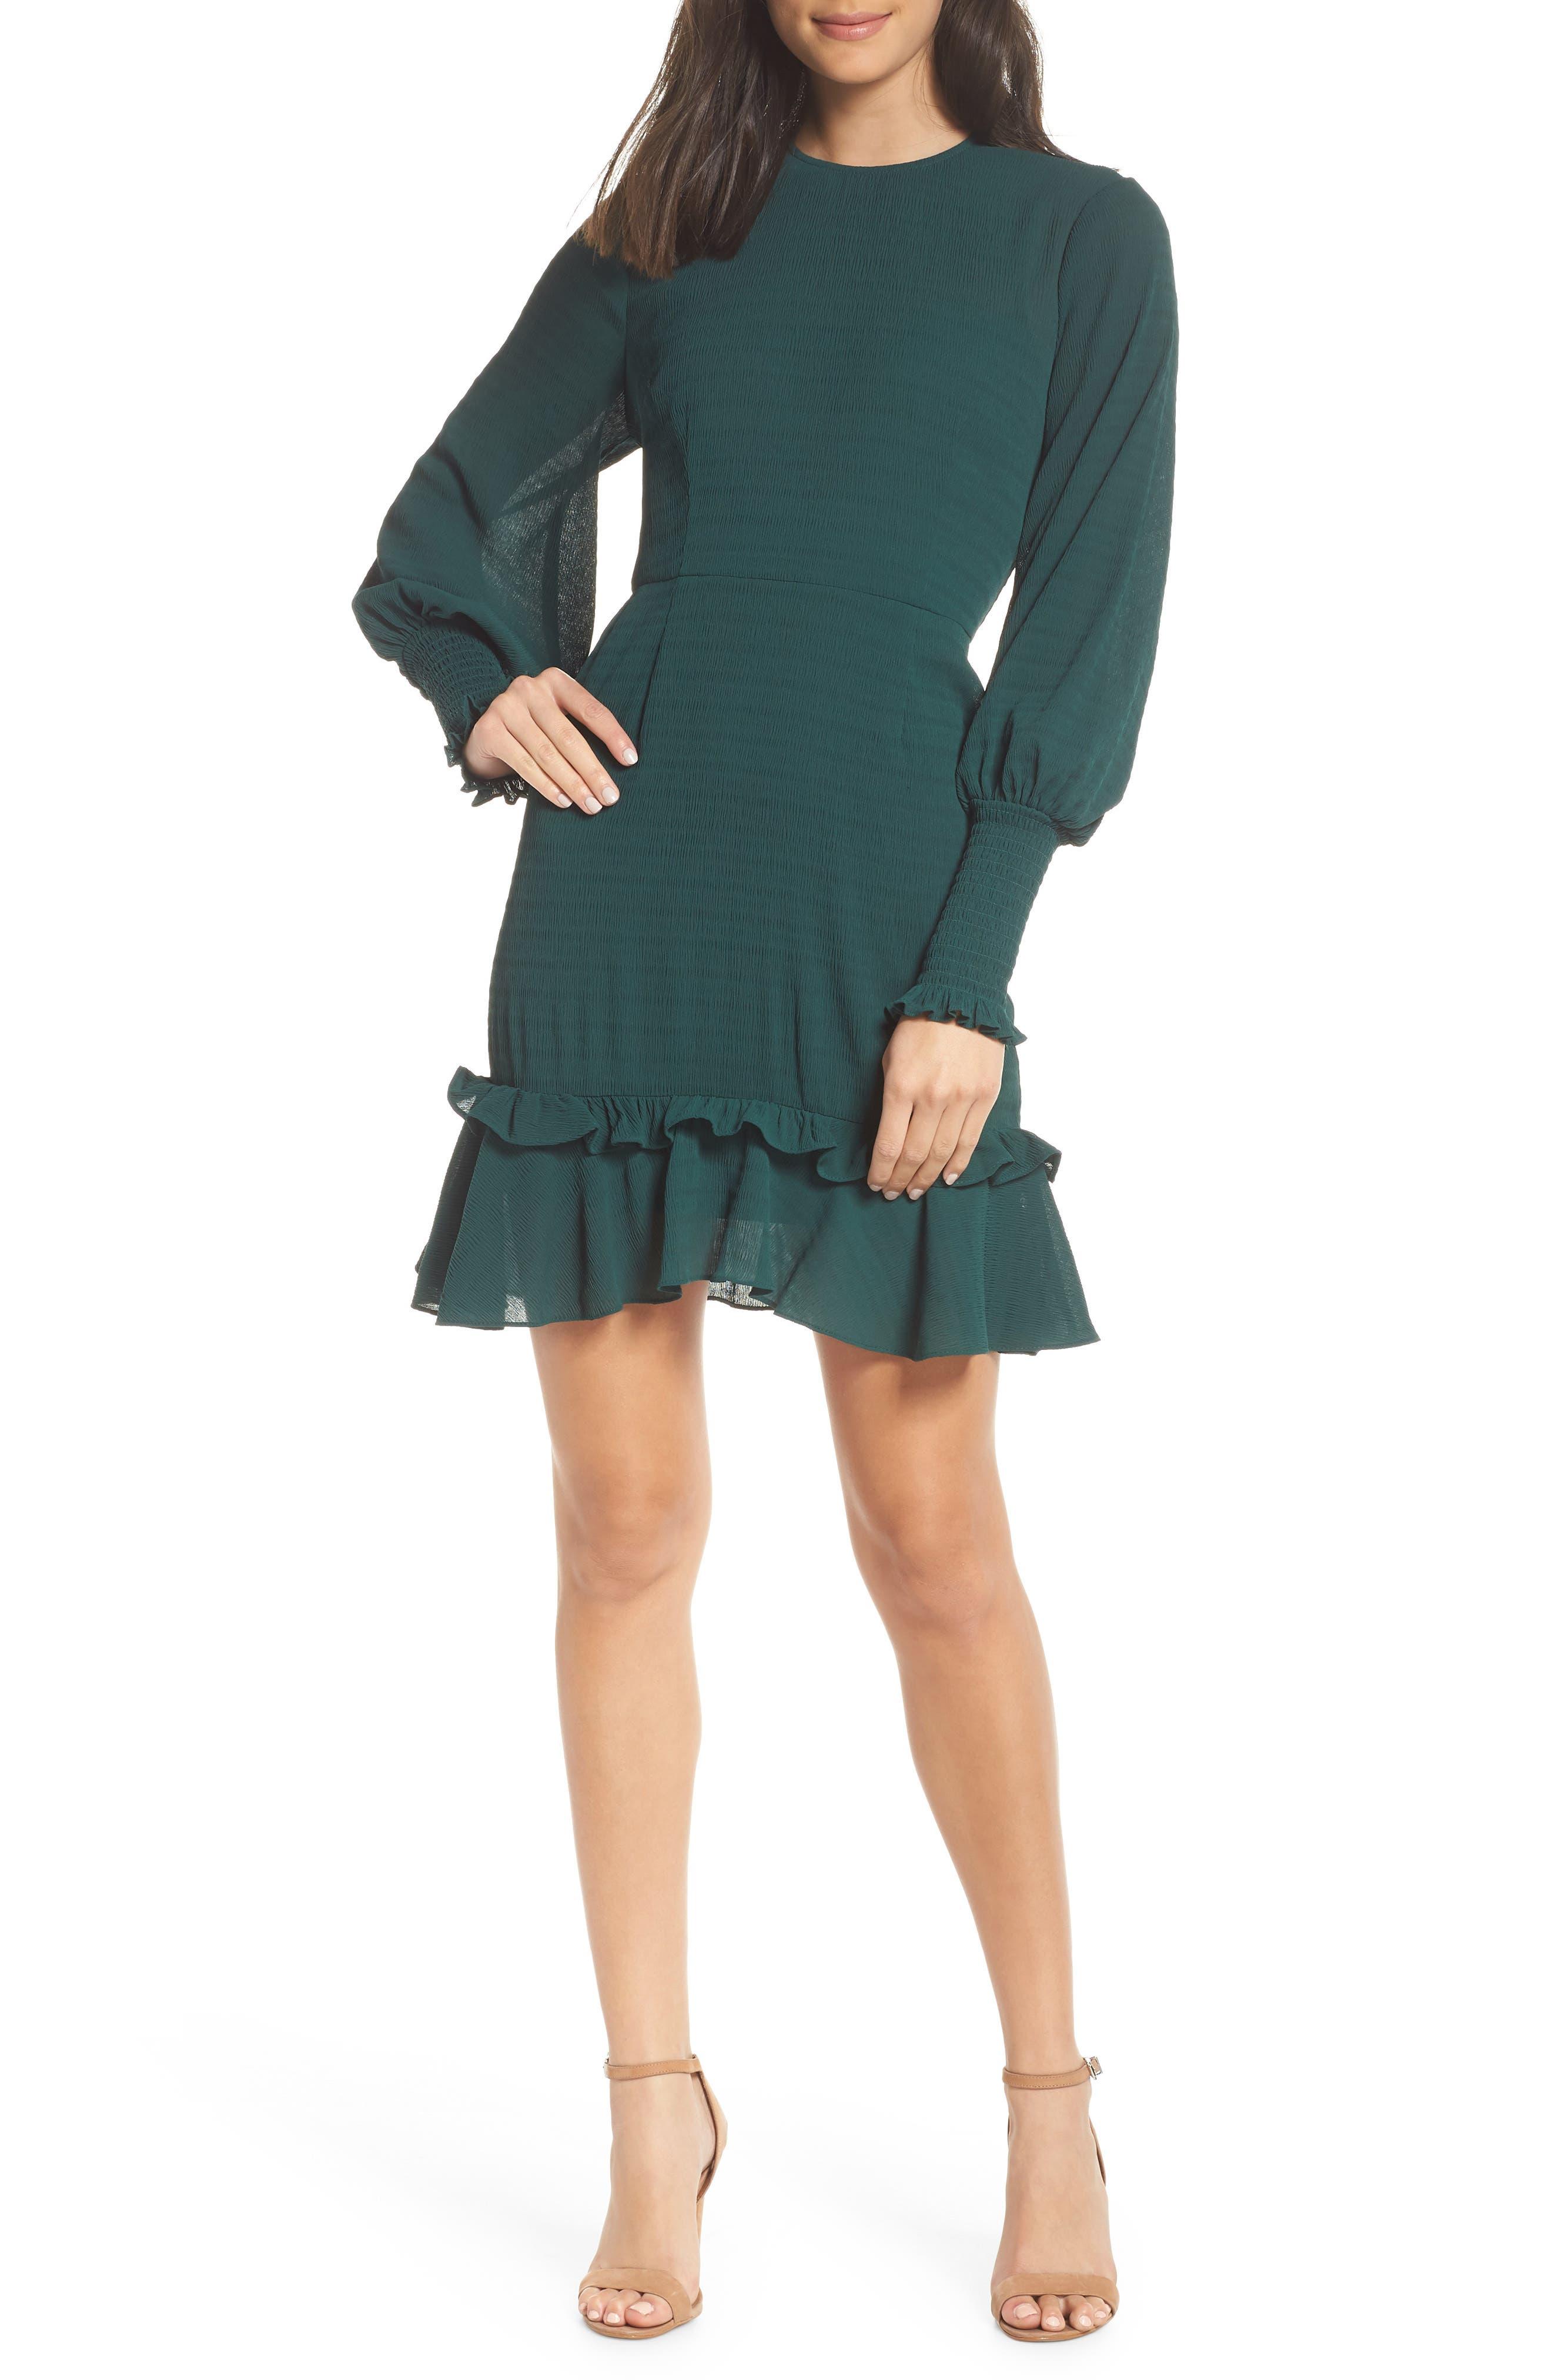 Chelsea28 Ruffle A-Line Dress, (similar to 1-1) - Green